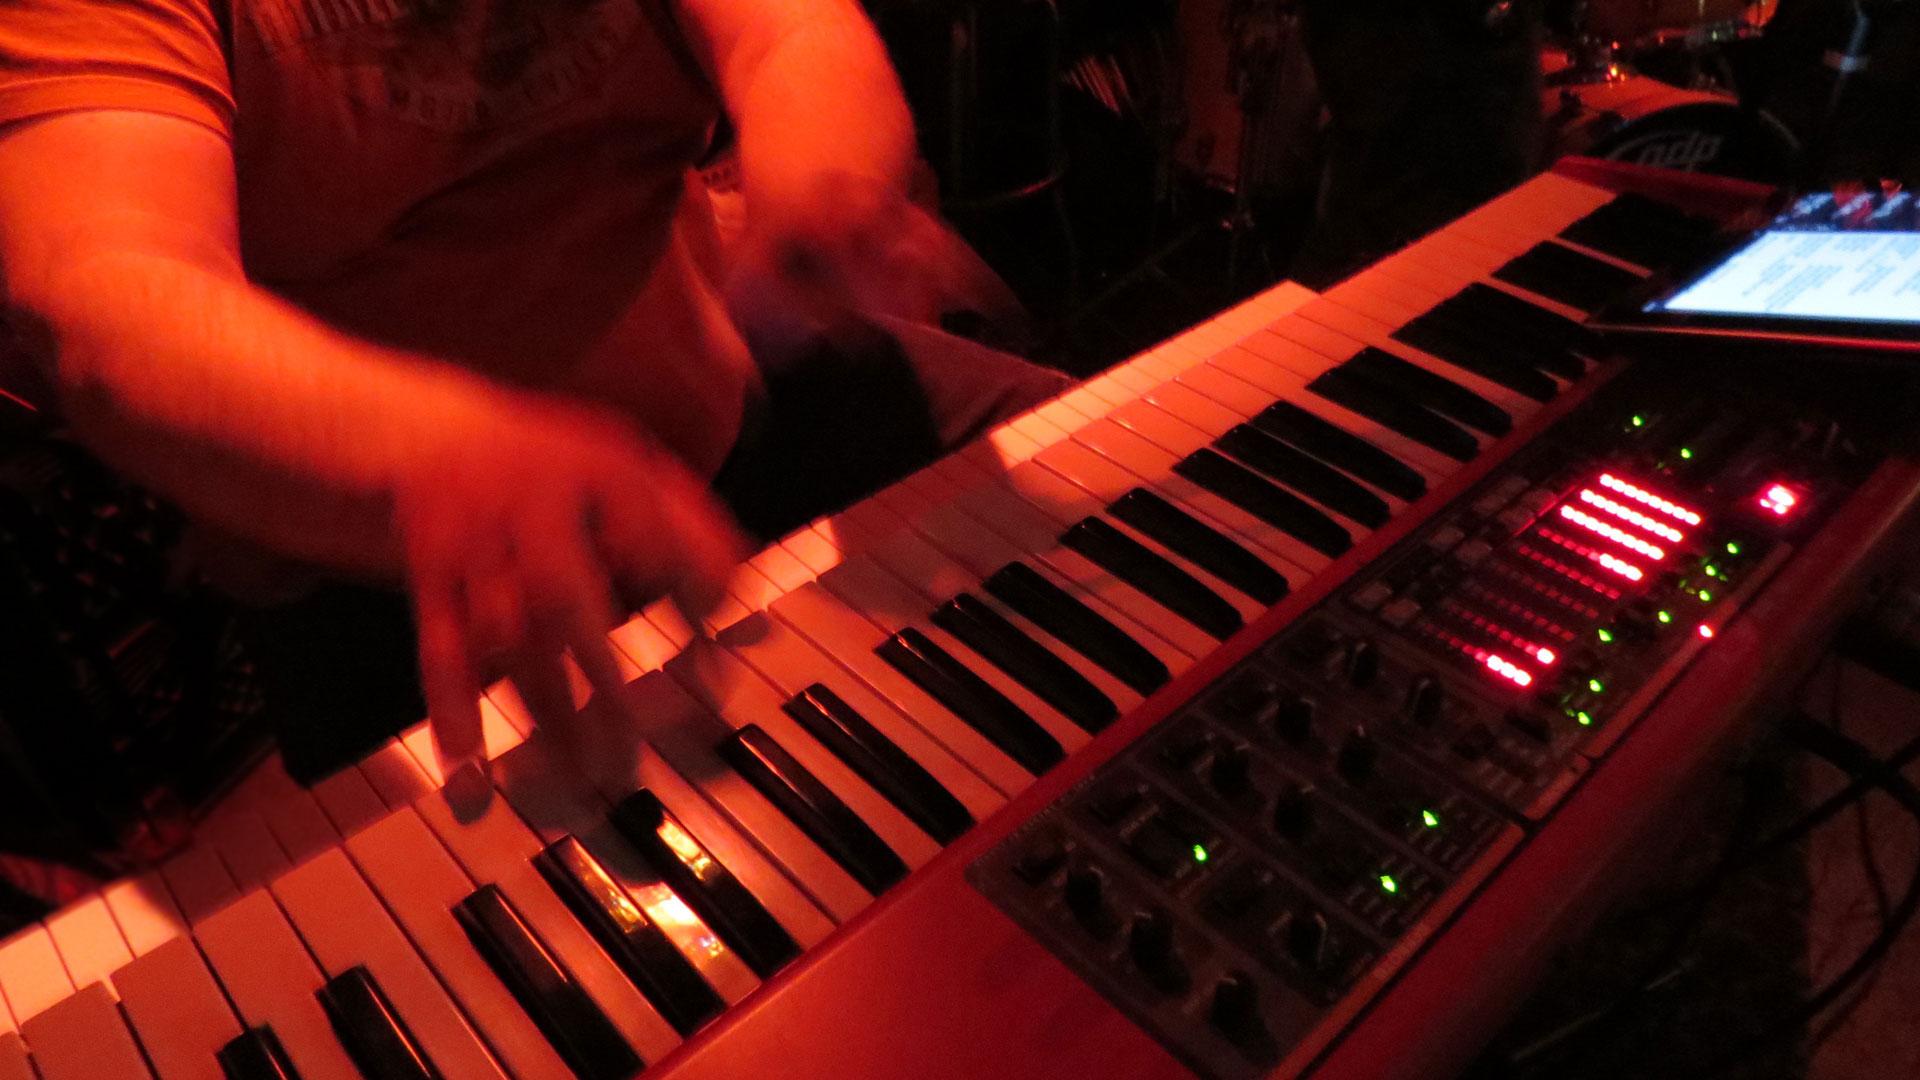 Image: Mark Bentley, hands on keyboard, blurred, red lighting (1920x1080px)